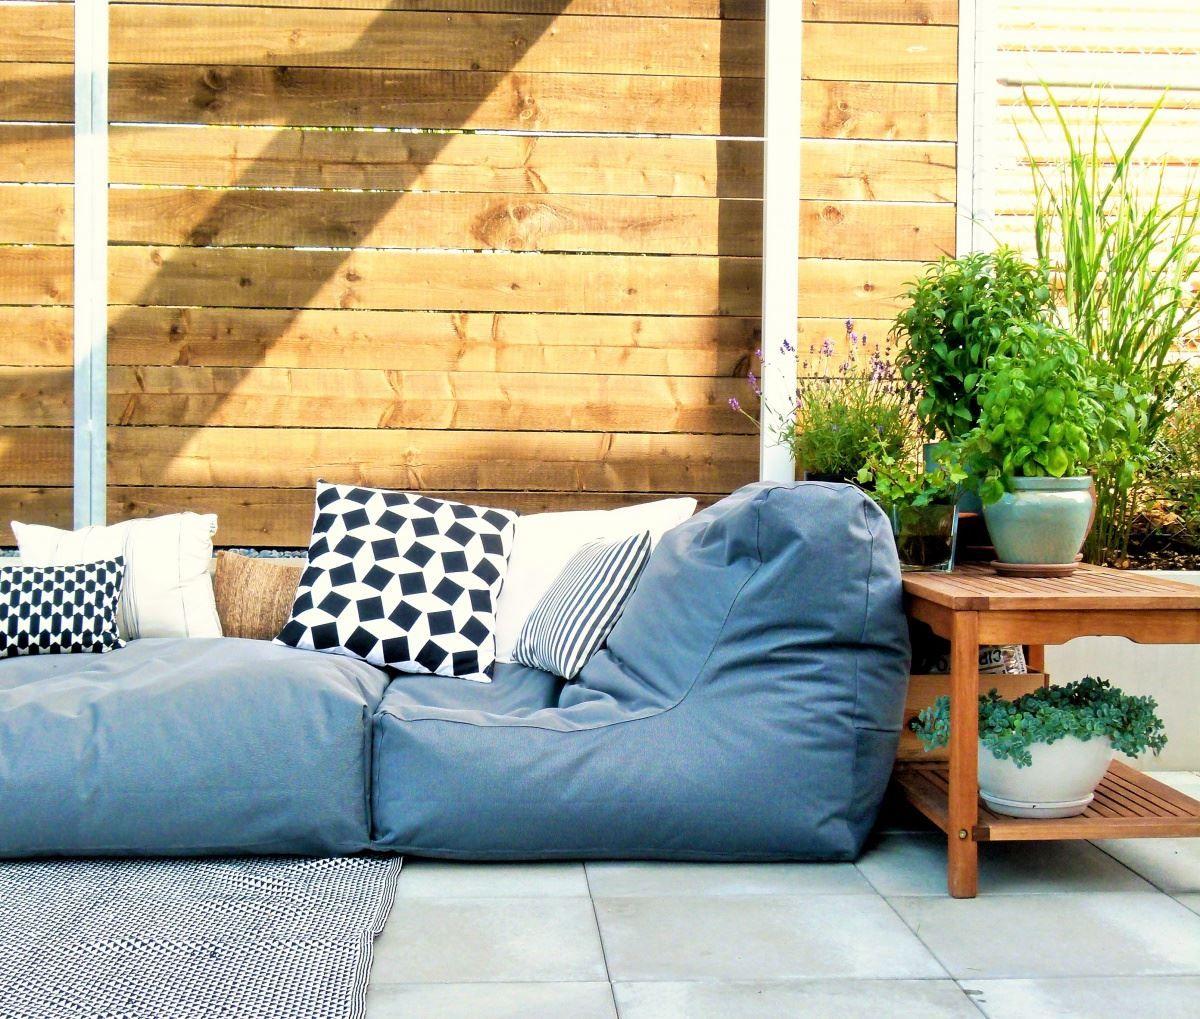 drau en holz kissen liegen sitzen sitzkissen bank. Black Bedroom Furniture Sets. Home Design Ideas